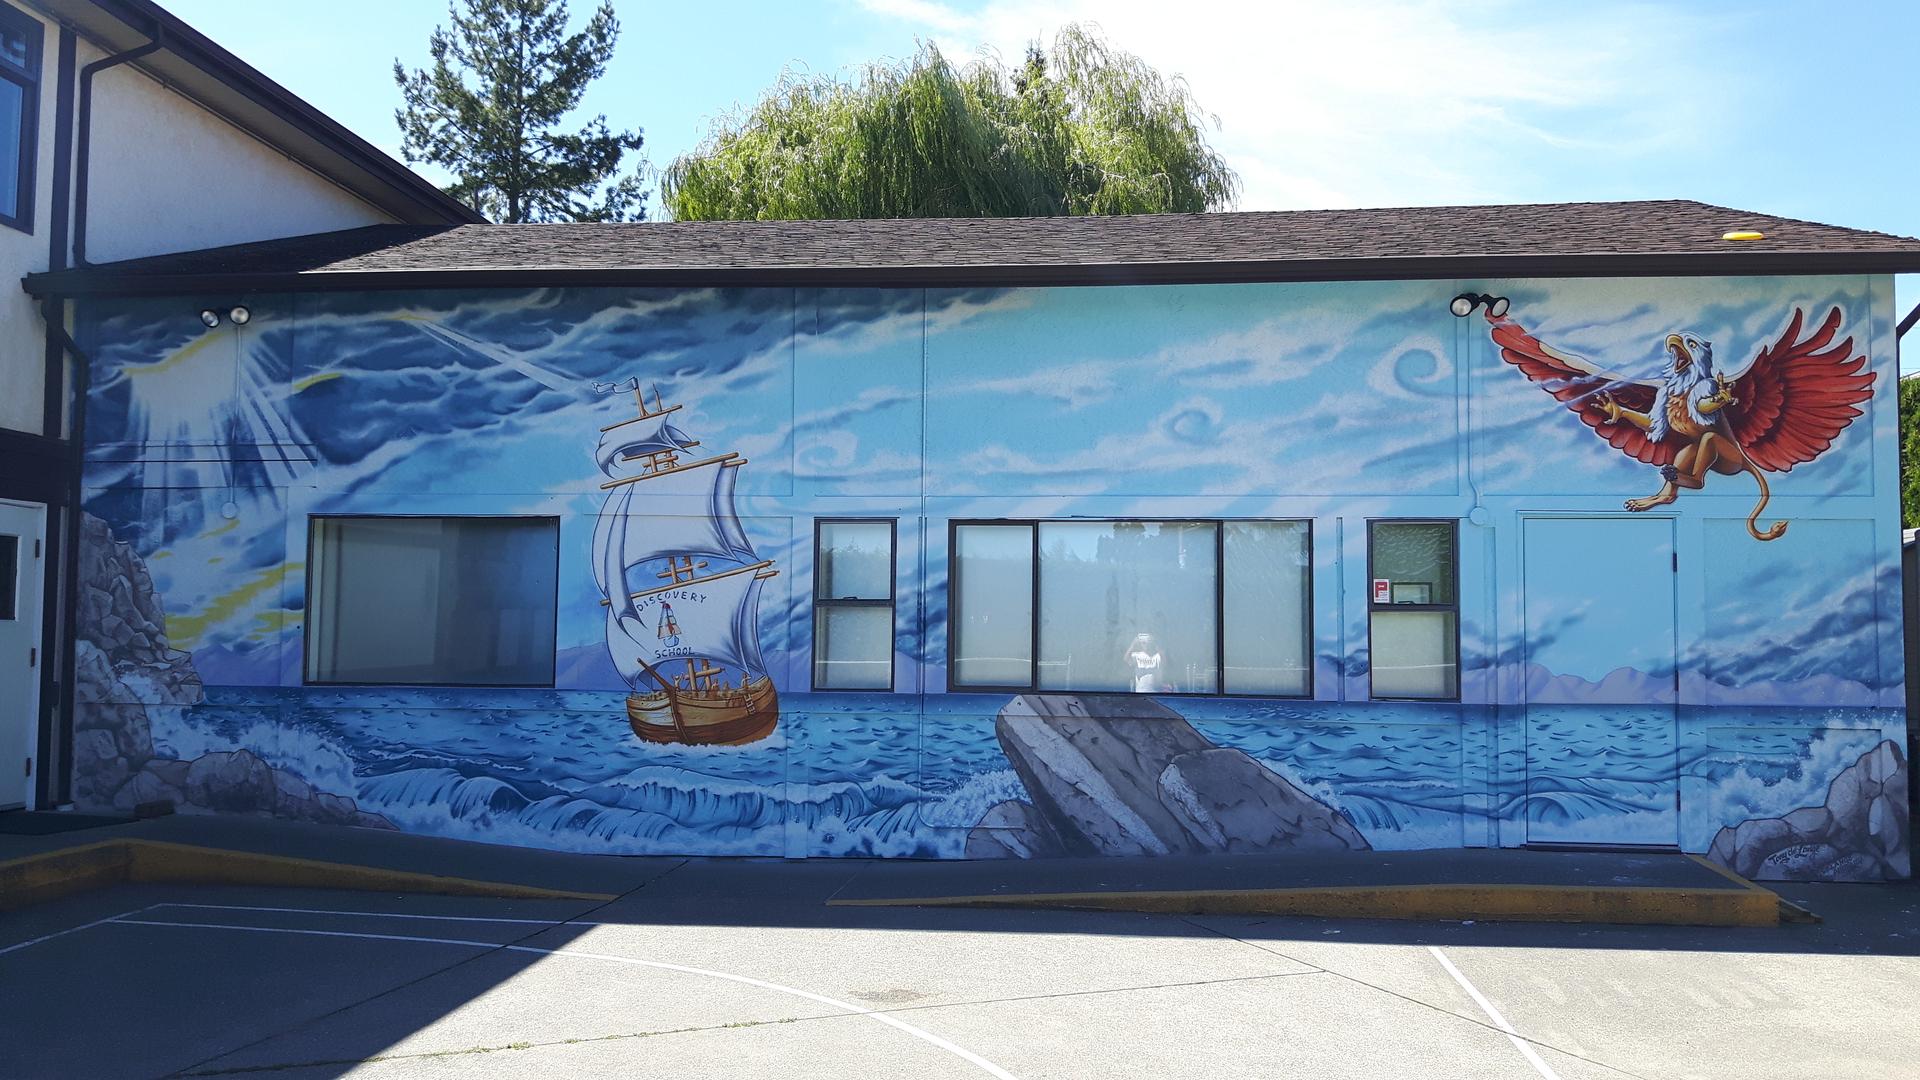 mural step by step delange airbrush